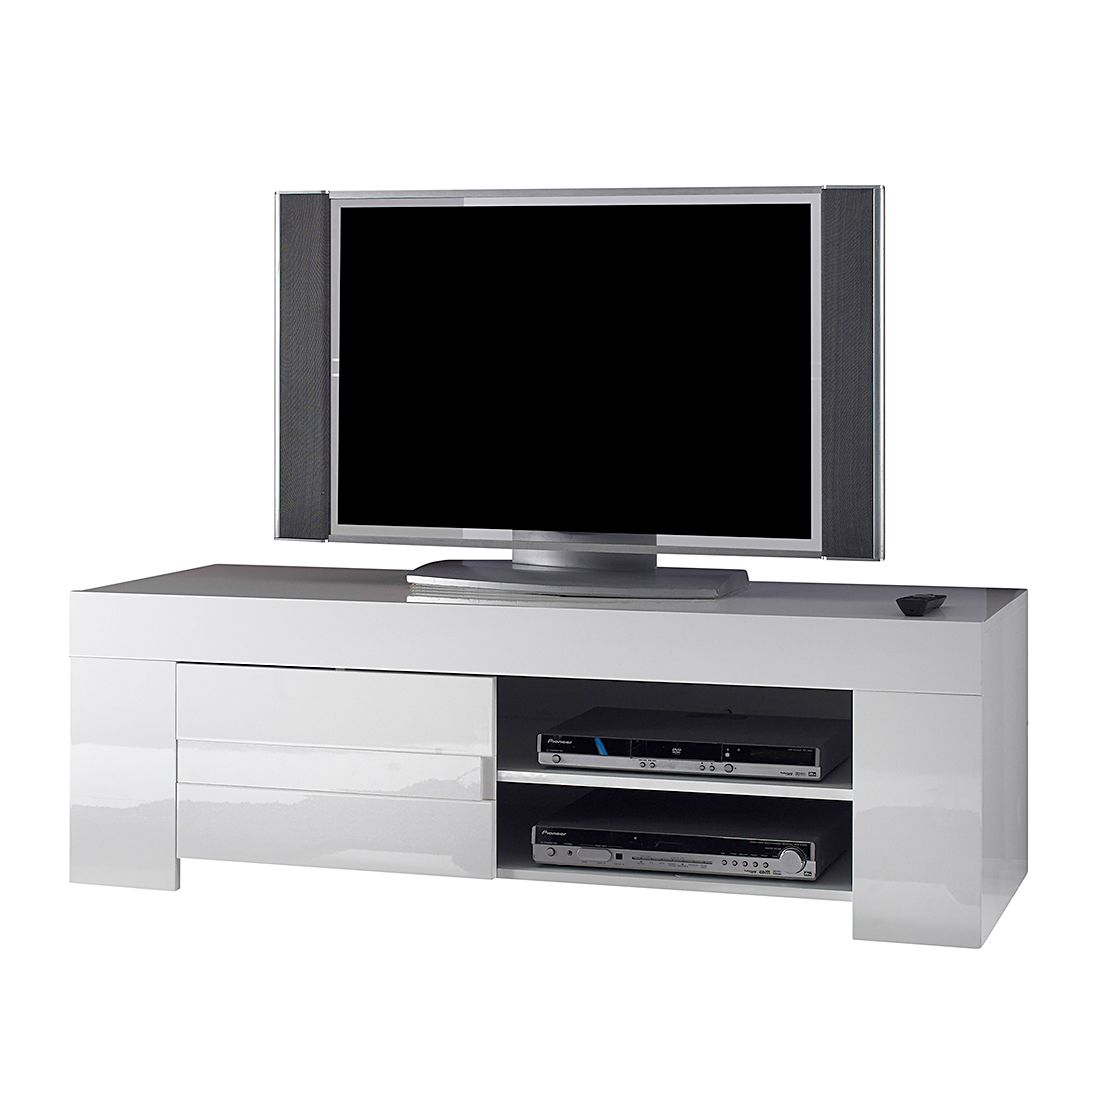 TV-Lowboard Gladiolo – Hochglanz Weiß / Weiß, LC Mobili jetzt kaufen